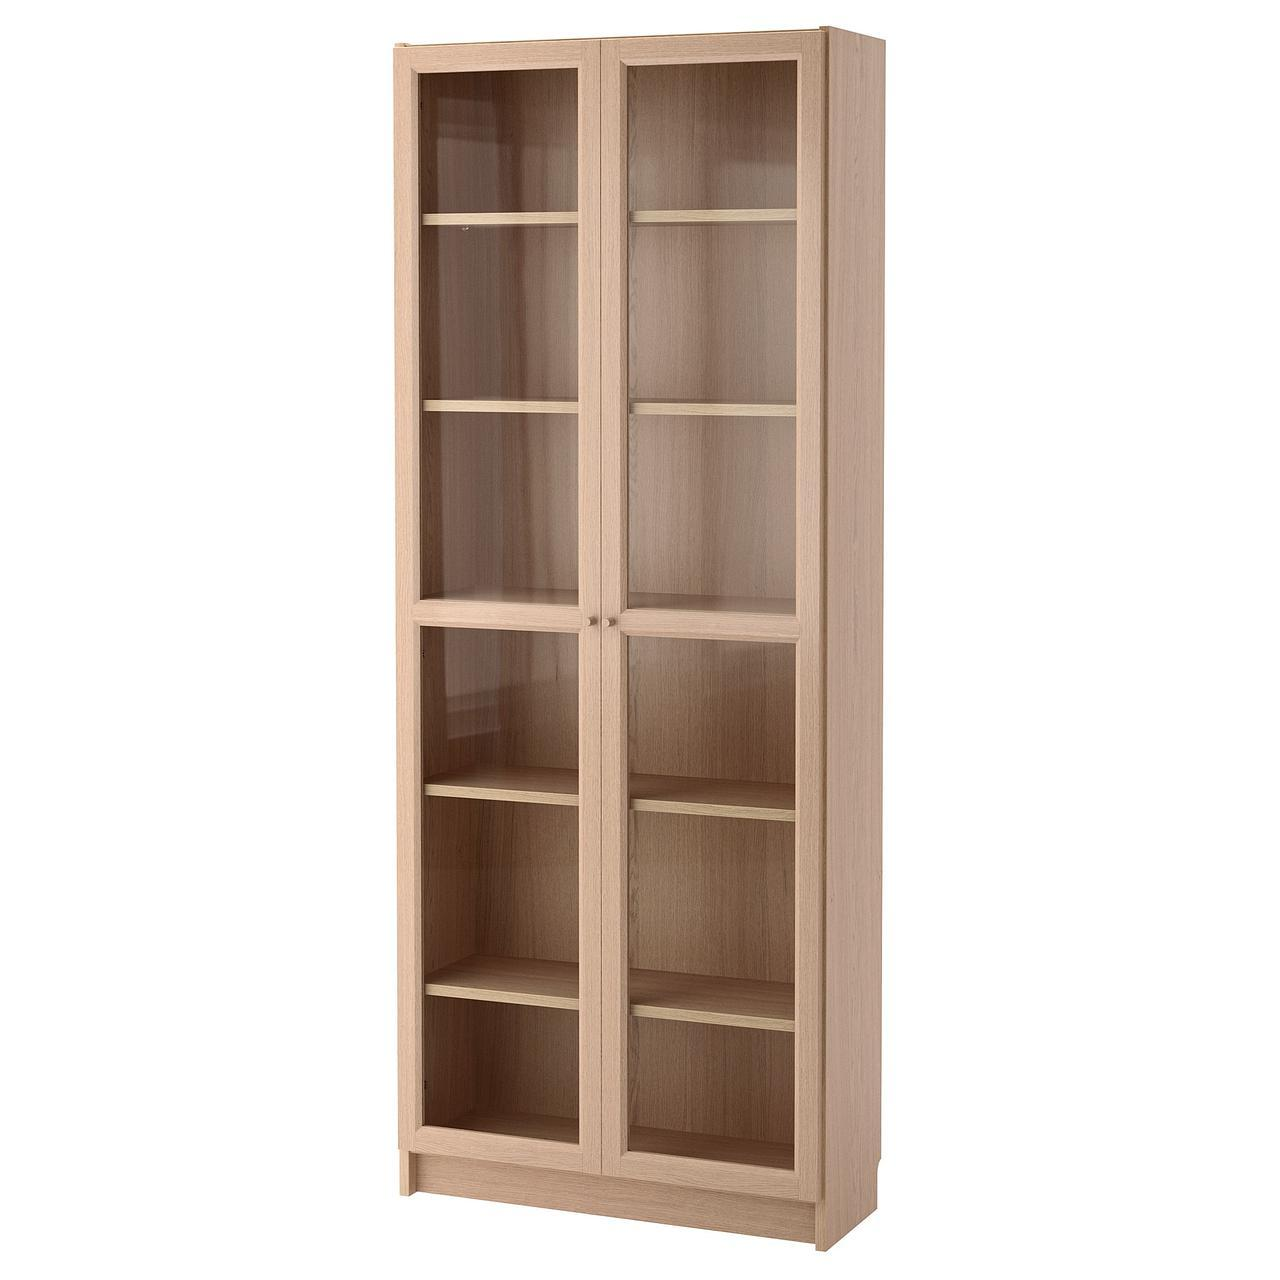 ✅ IKEA BILLY / OXBERG (292.499.72) Шкаф/Сервант, белый